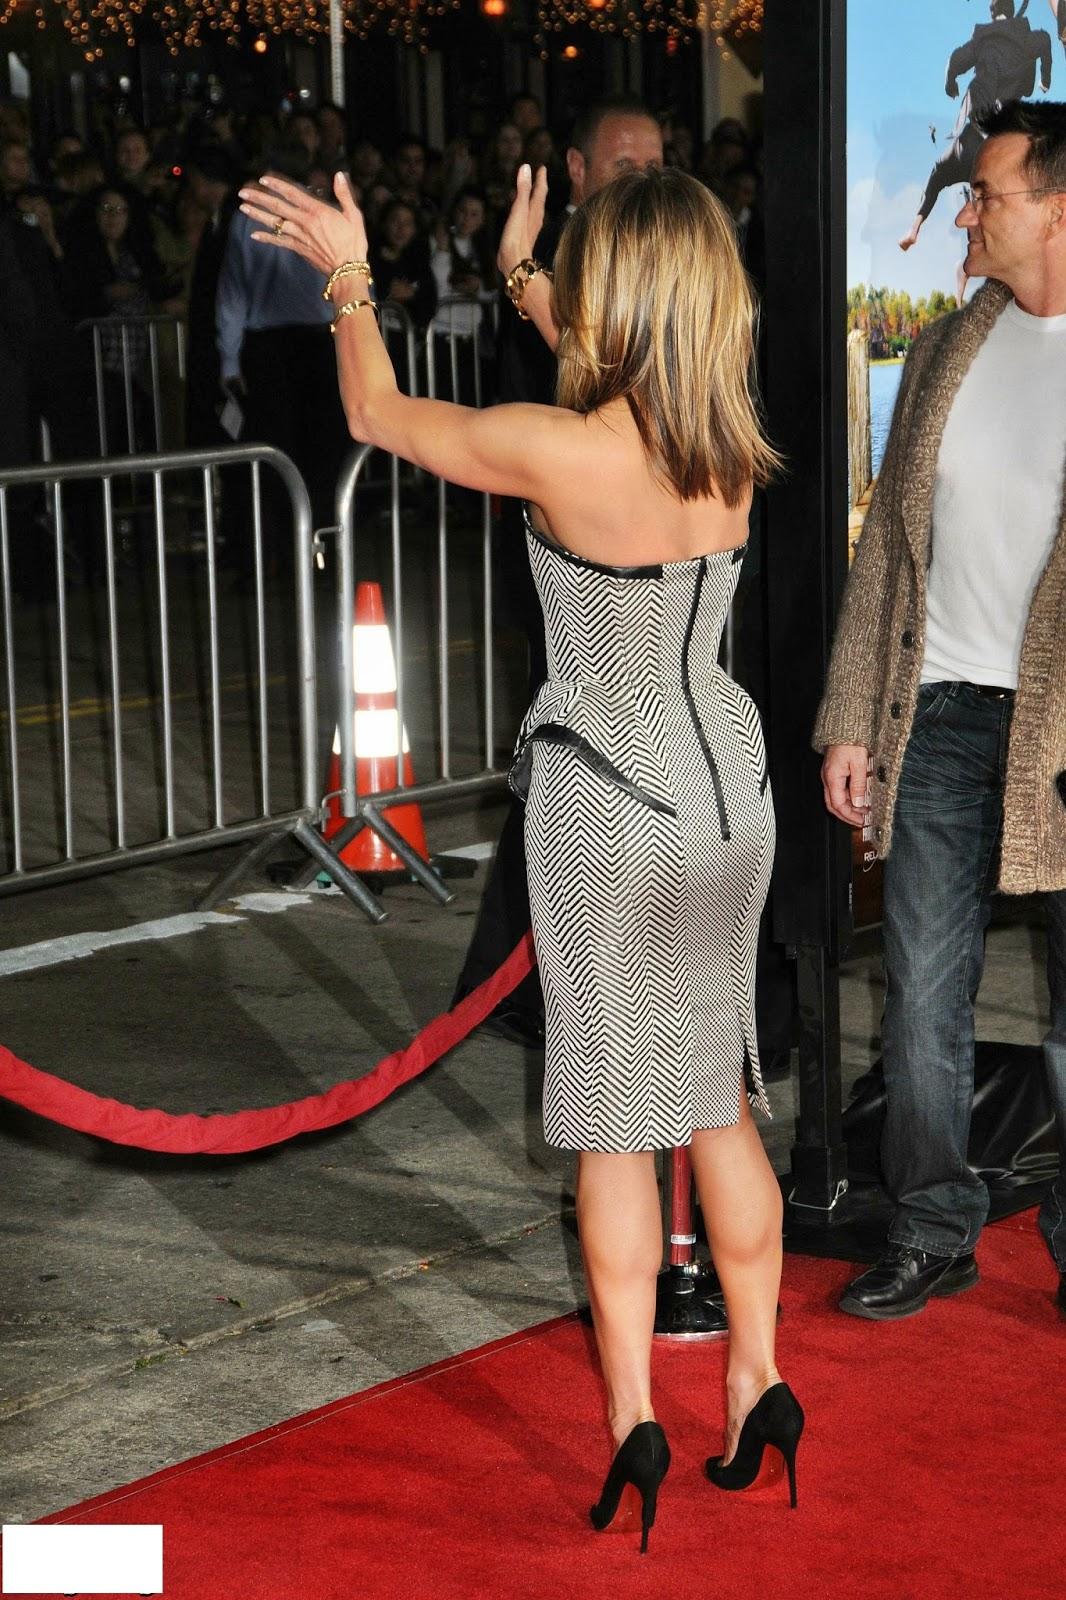 WOMENs muscular ATHLETIC LEGS especially CALVES  daily update Jennifer Aniston CALVES update